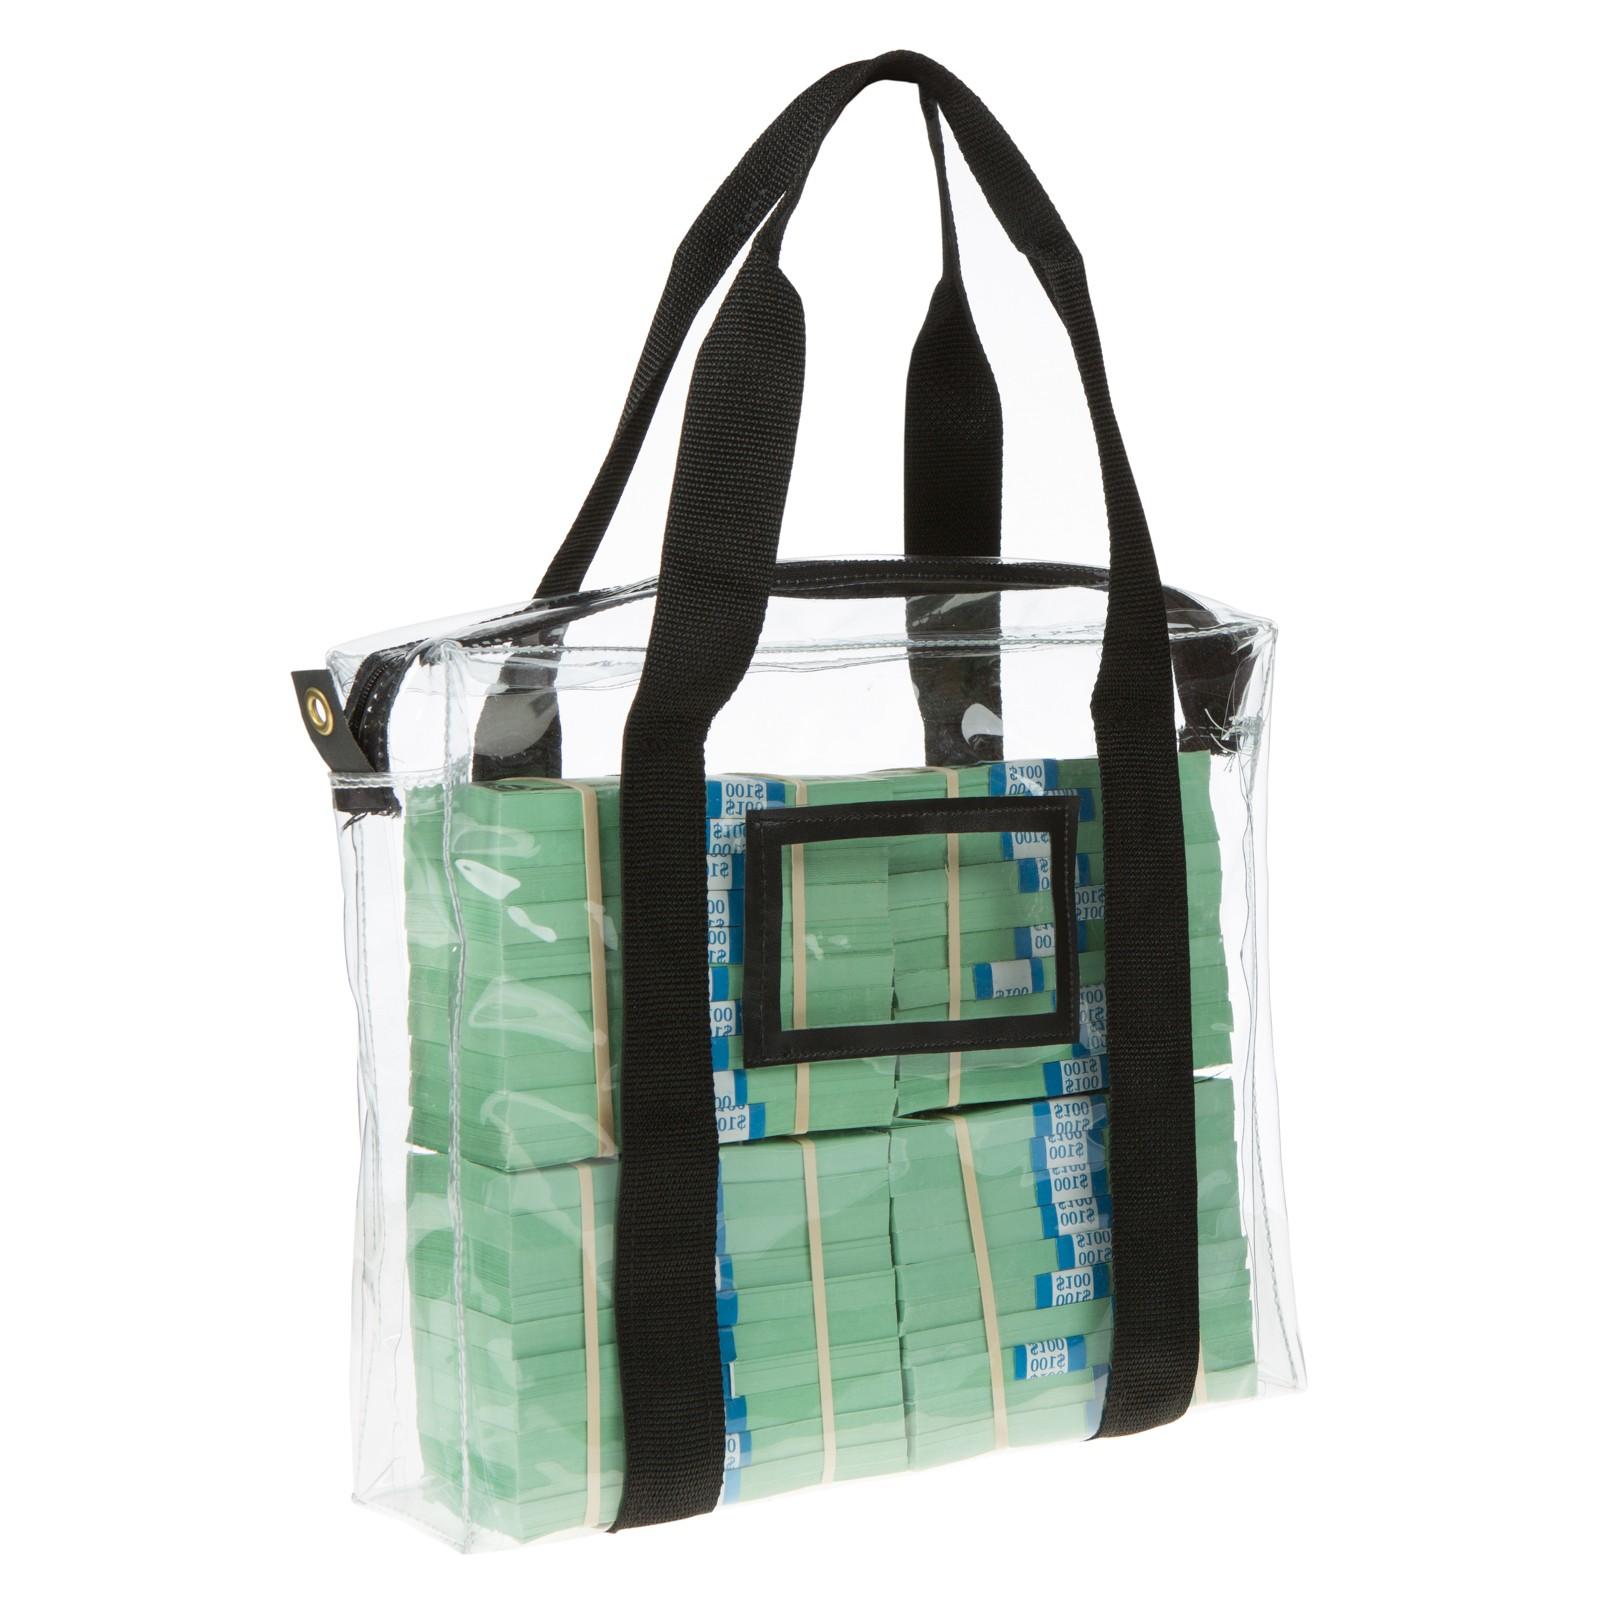 14w X 11h X 3d Clear Vinyl Bag W Handles Made To Order